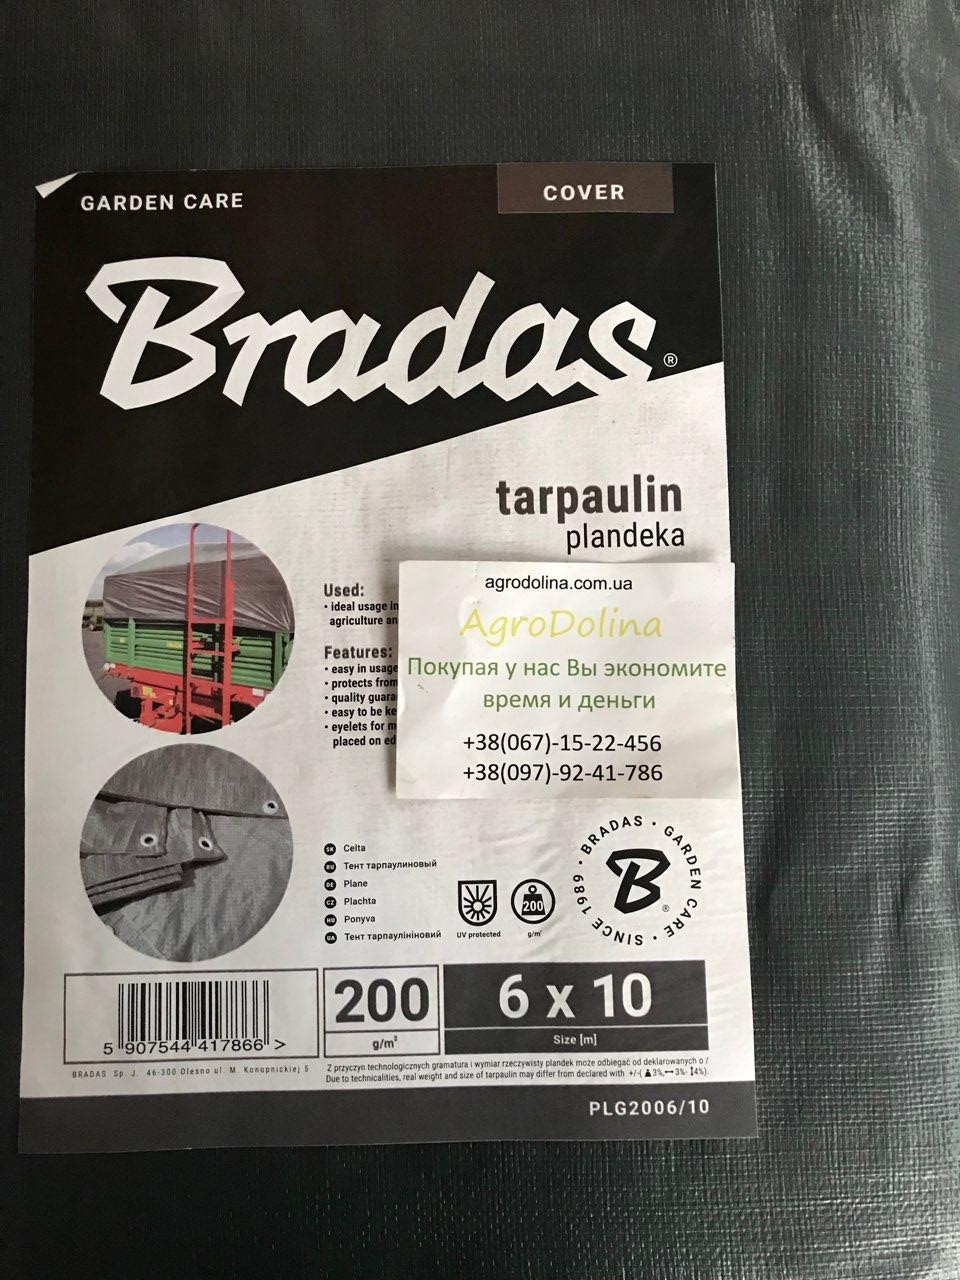 Тент Bradas темно-серый тарпаулин  200 гр/м², размер 6х8м